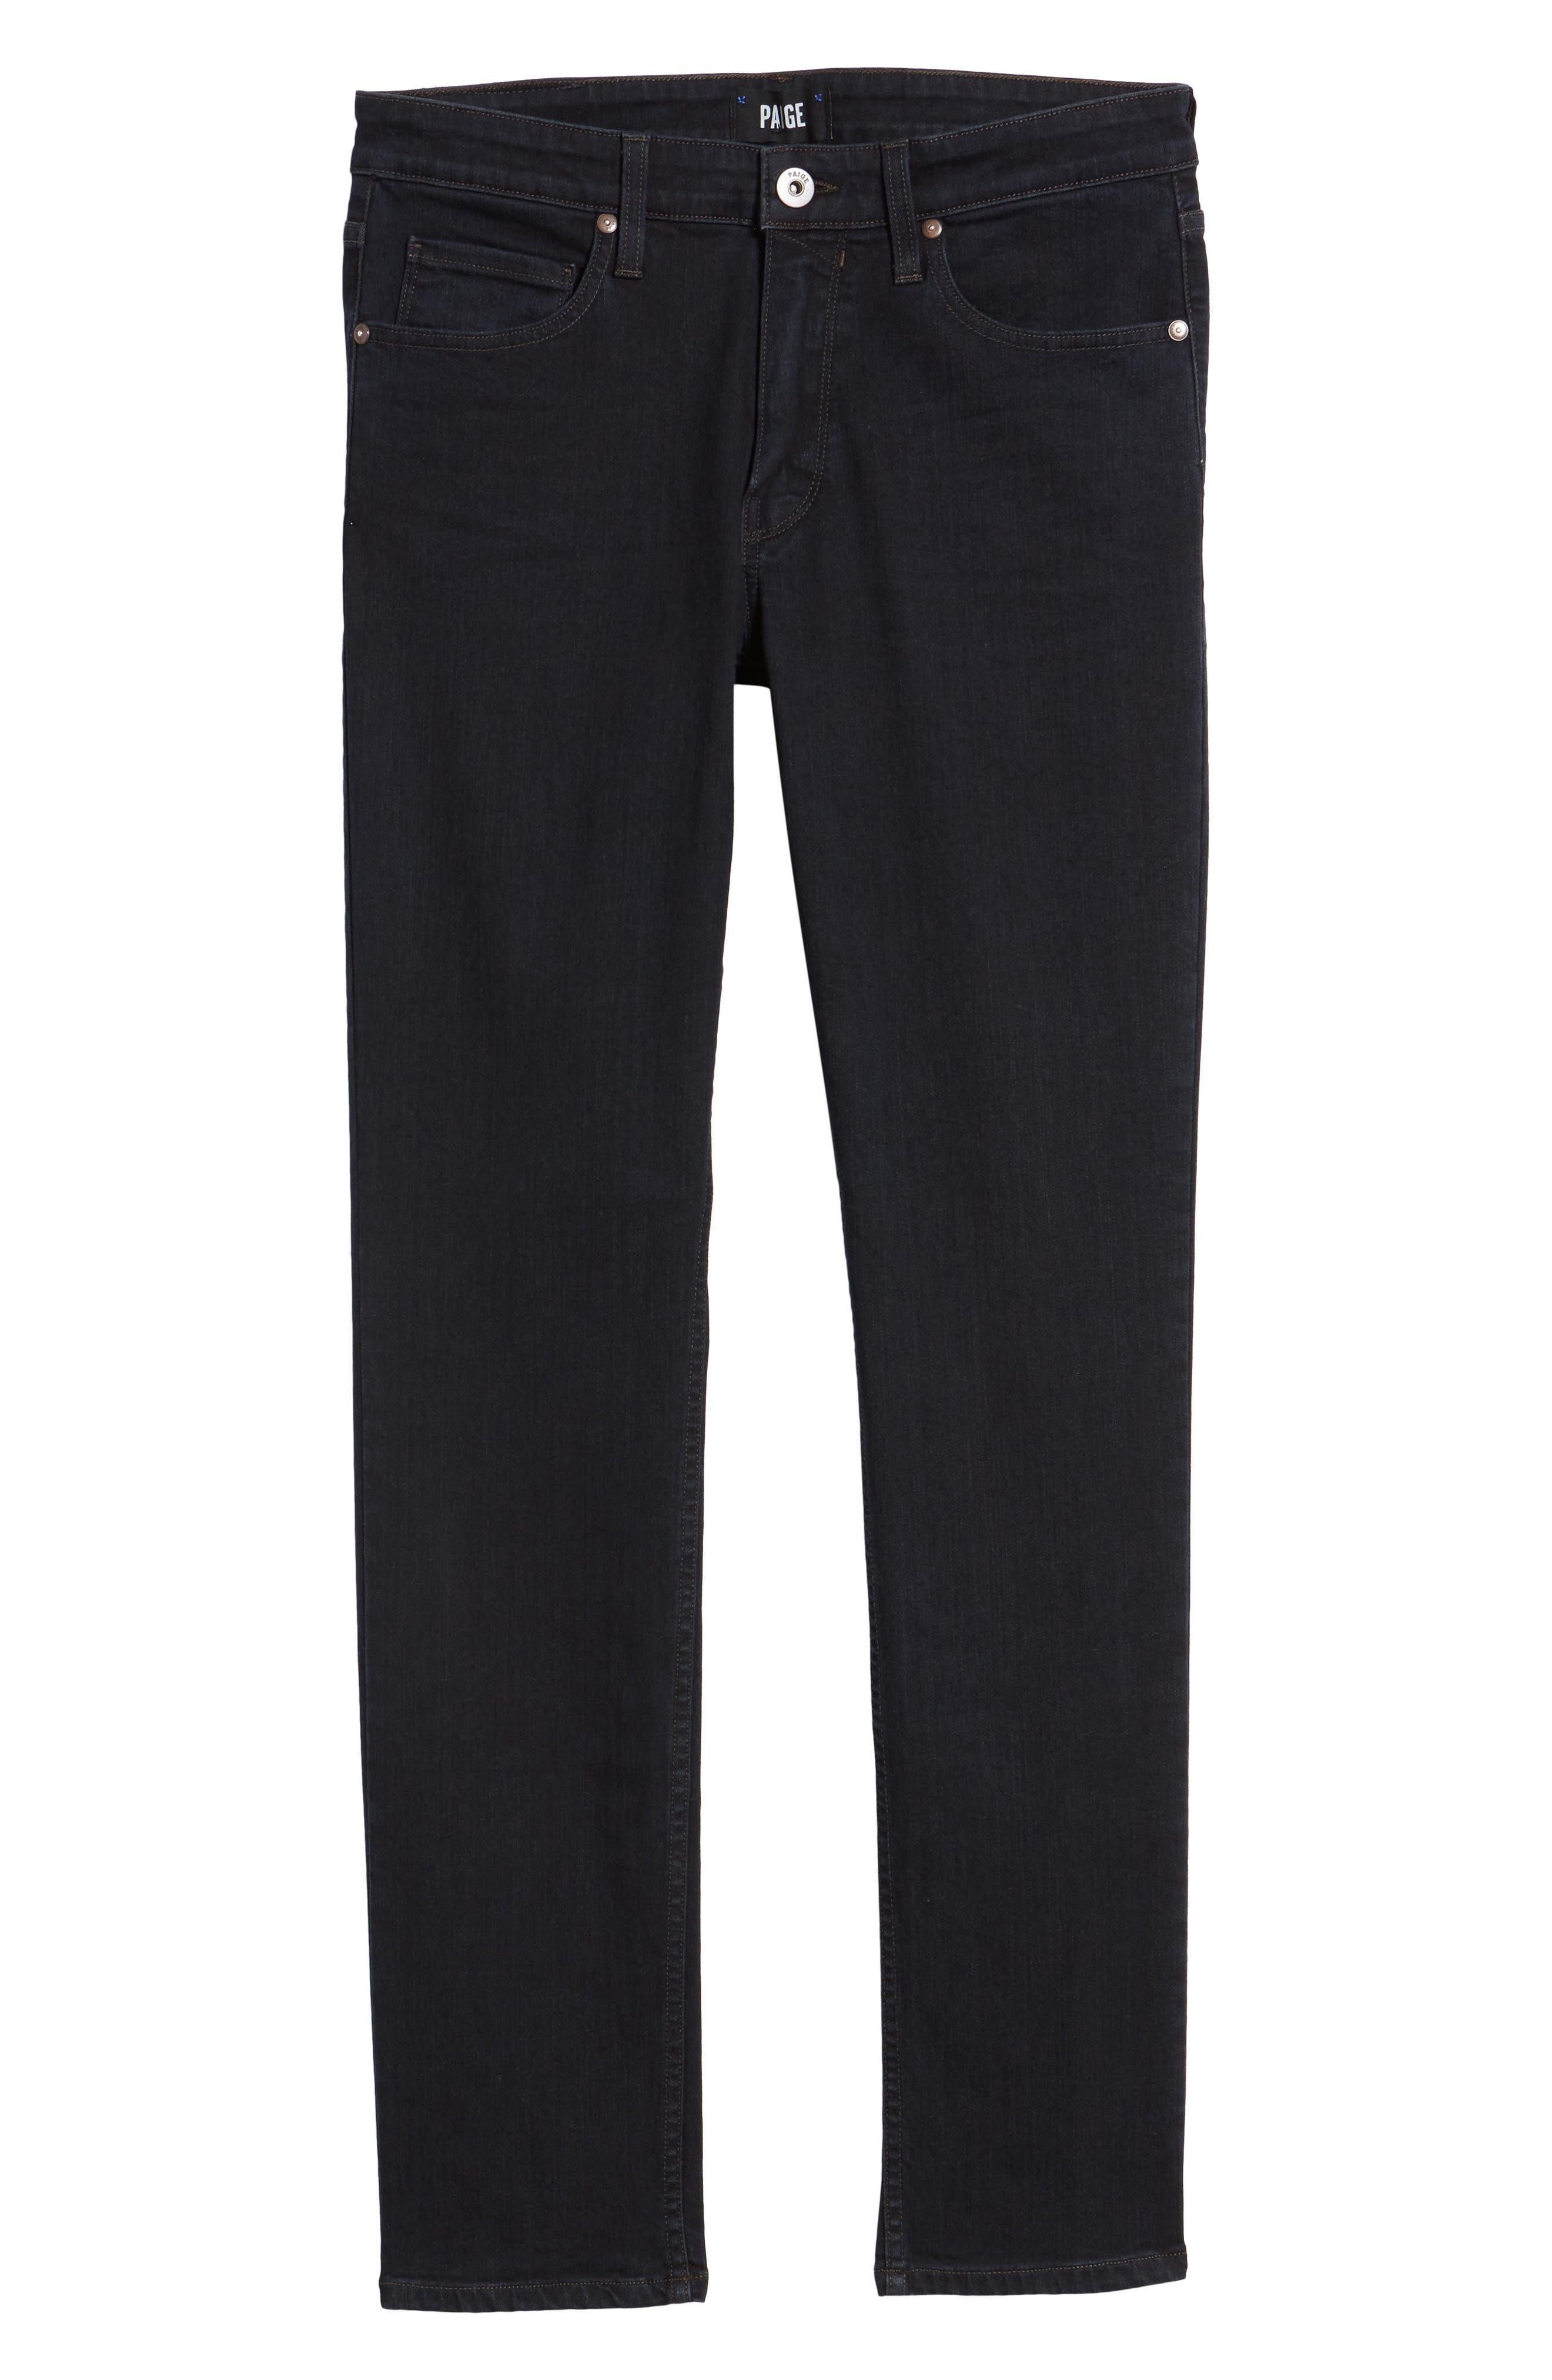 Lennox Slim Fit Jeans,                             Alternate thumbnail 6, color,                             TOMMY